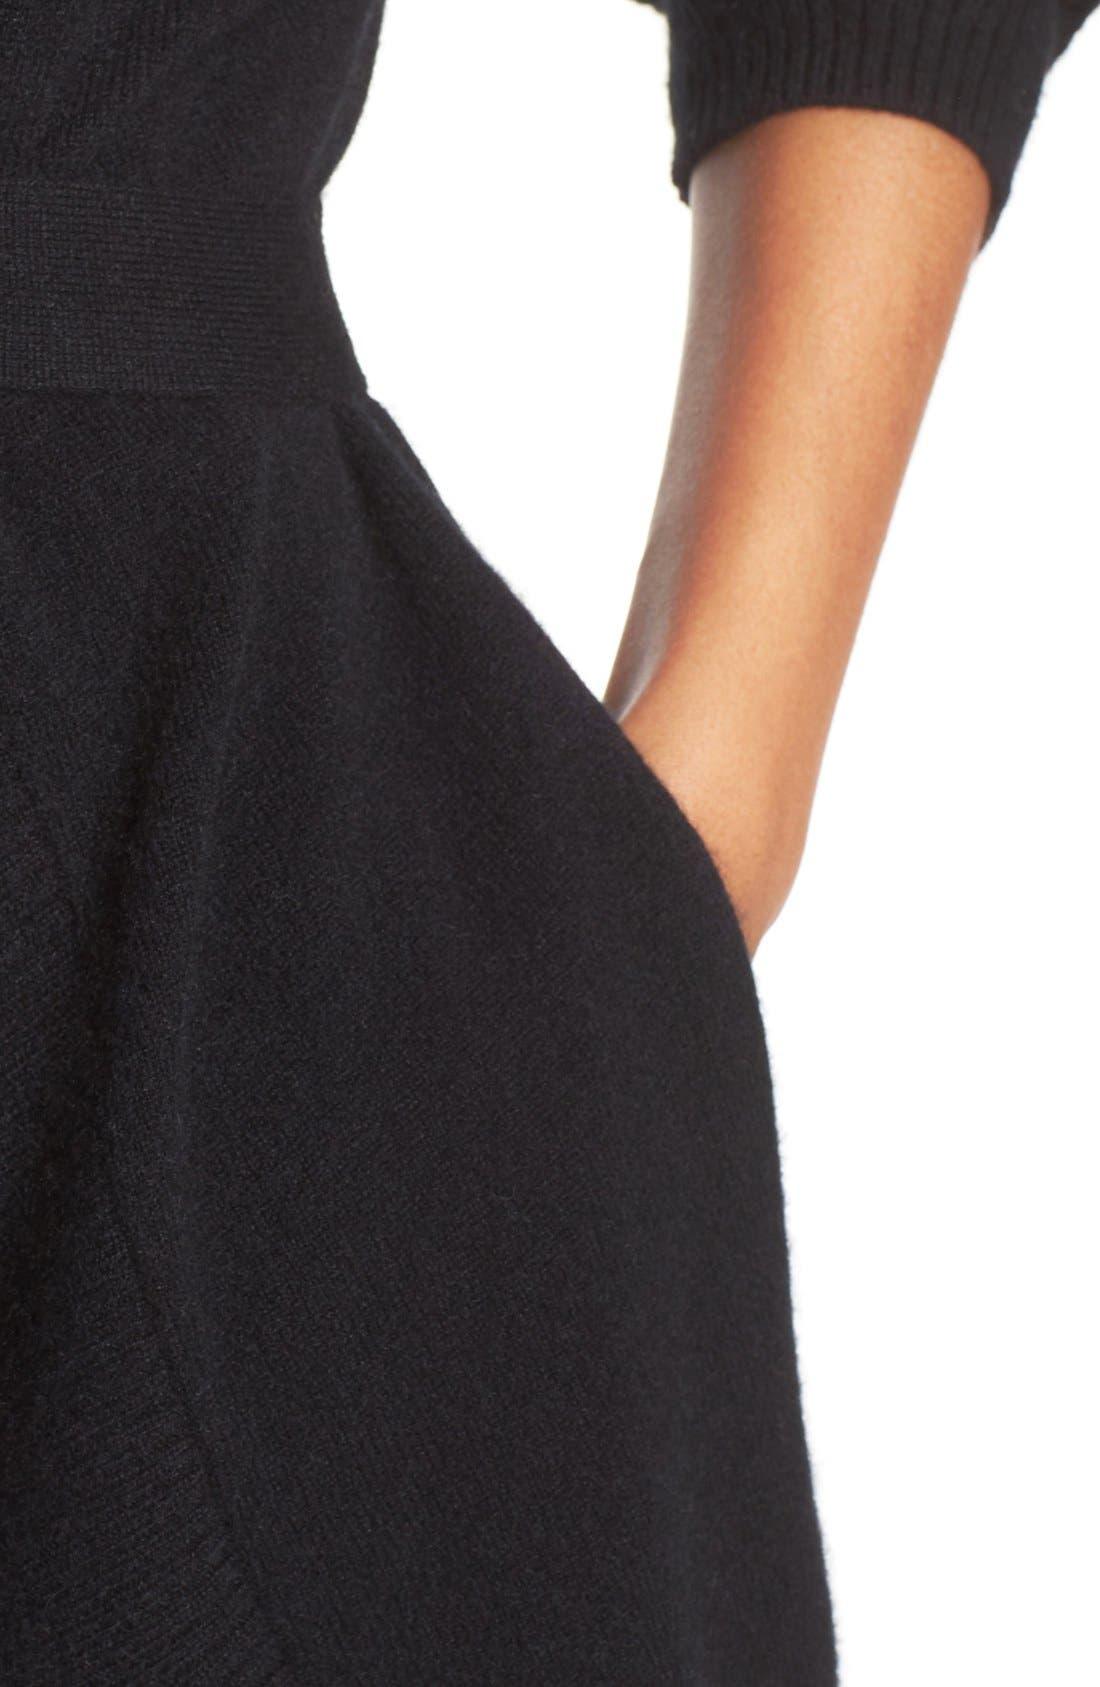 UGG 'Cheyenne' Cashmere Robe,                             Alternate thumbnail 4, color,                             Black